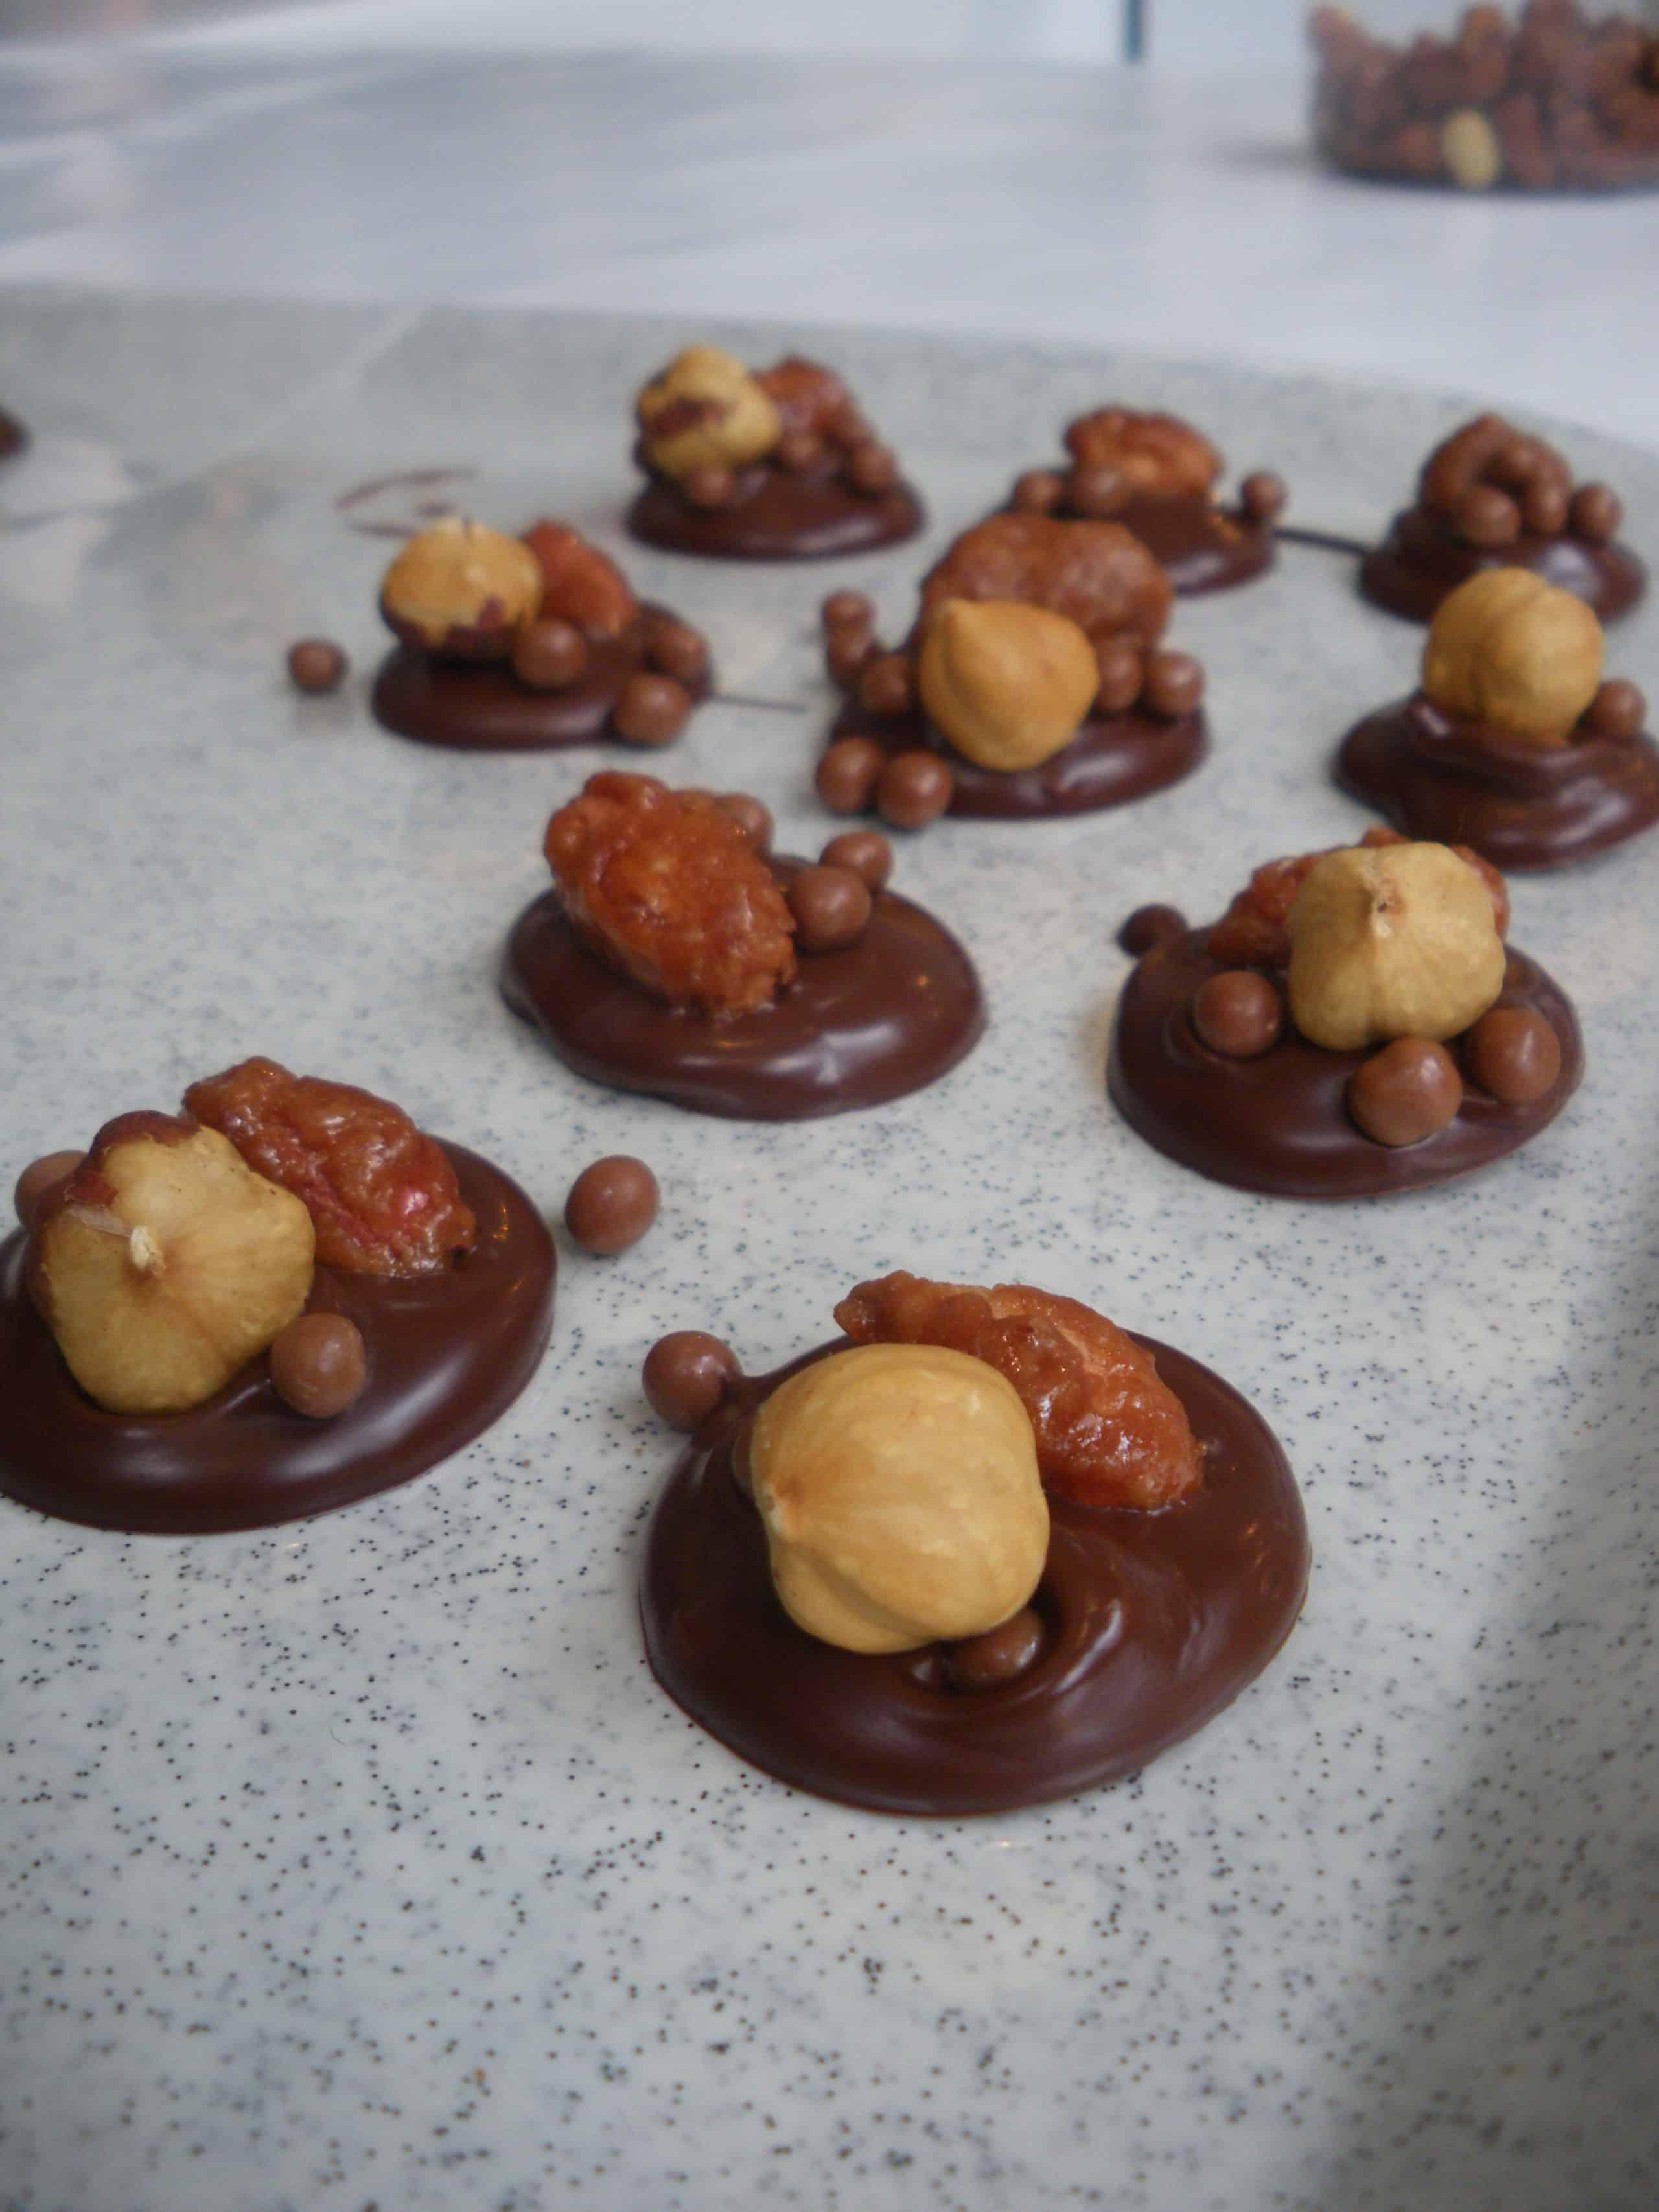 salon-blog-culinaire19